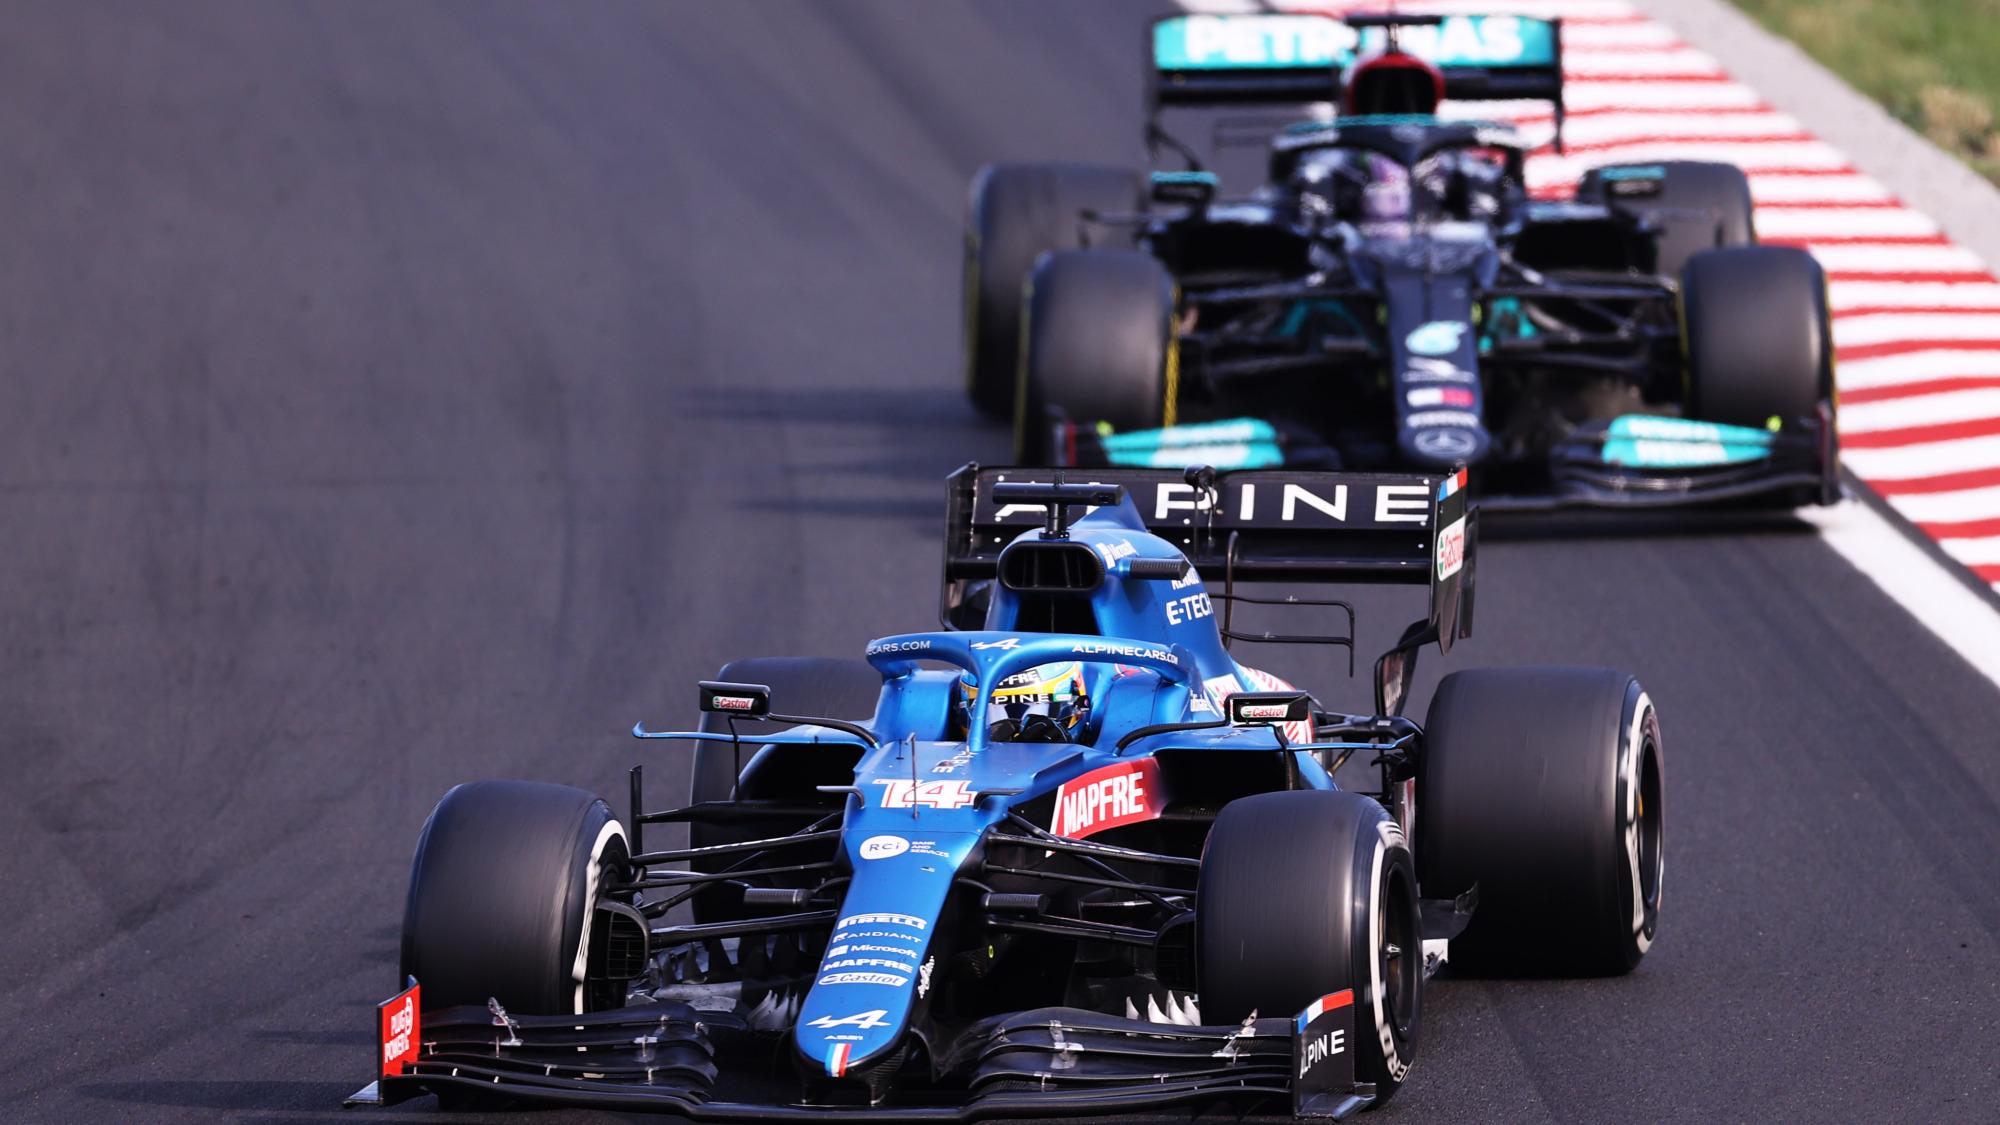 Fernando Alonso, 2021 Hungarian Grand Prix